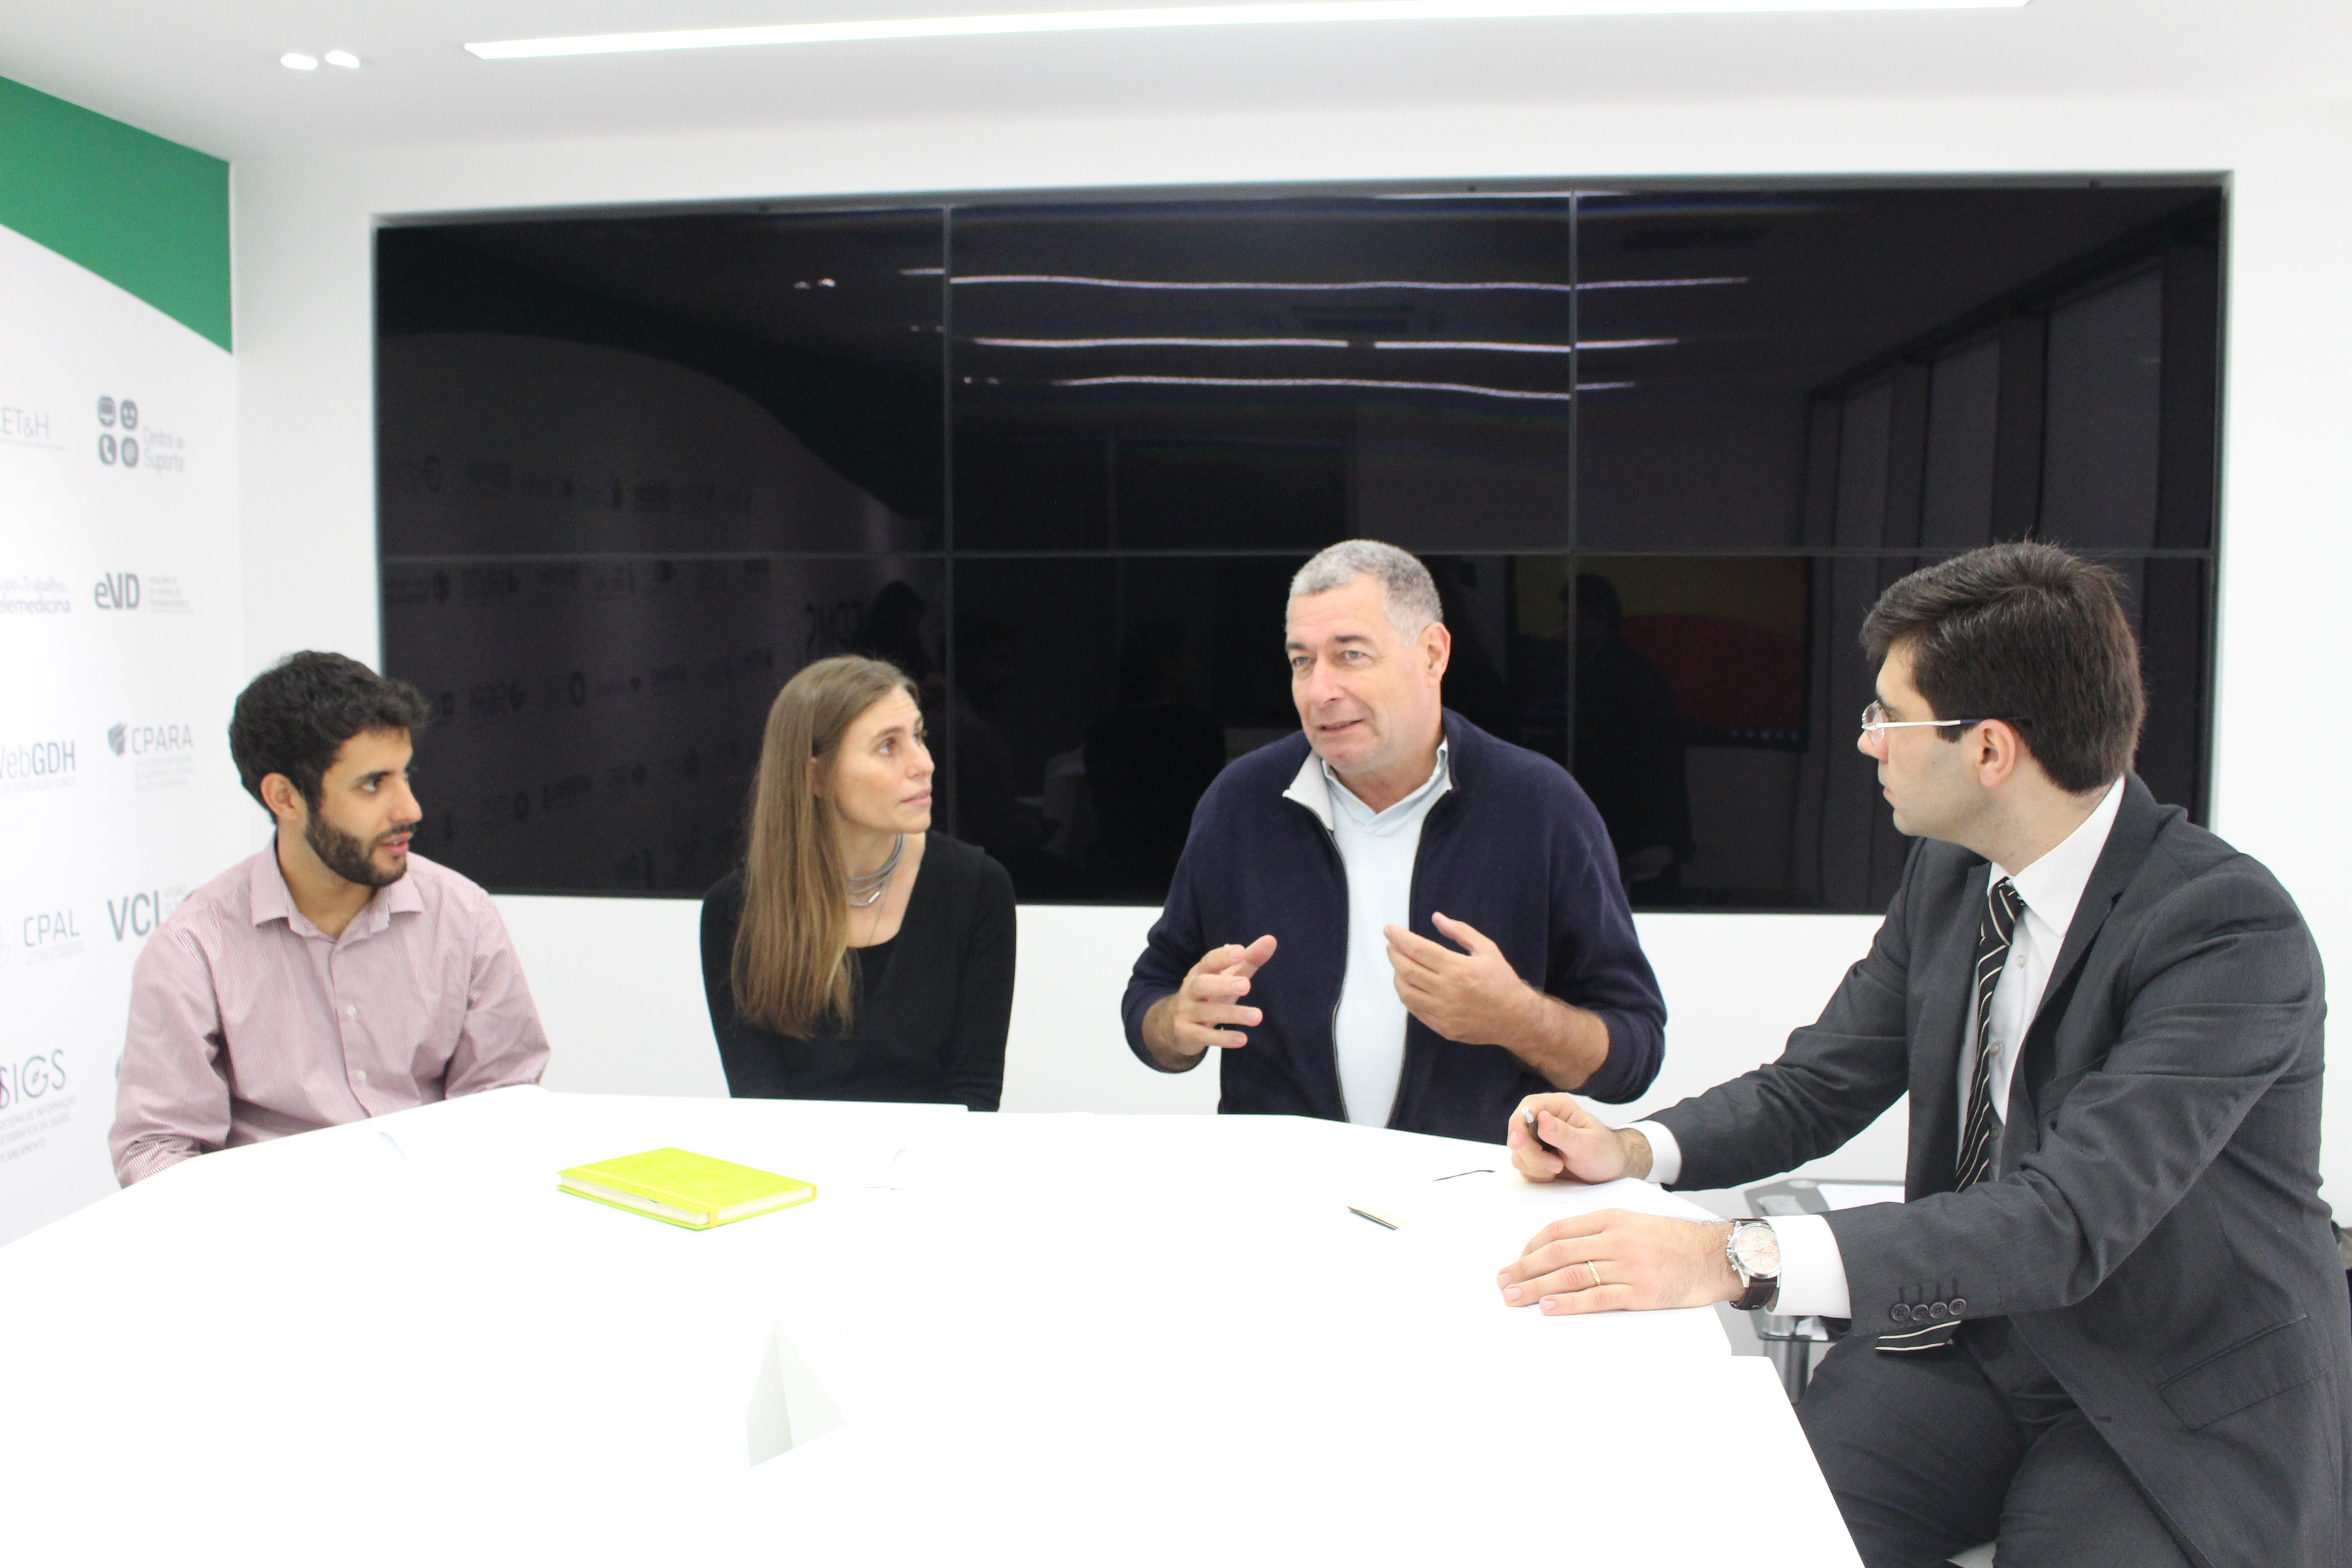 Tomé Vardasca, Rita Mendes, António Câmara e Pedro Moreira